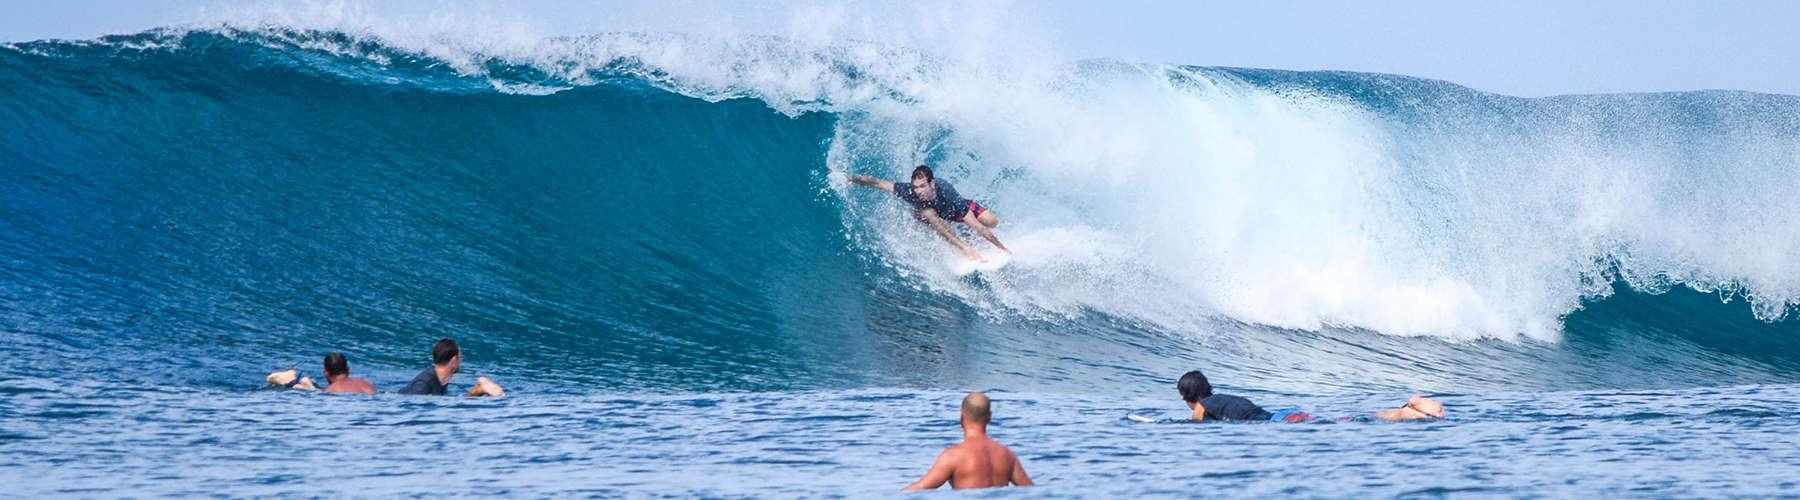 best surf destinations surfing surf travel stoked for travel blog